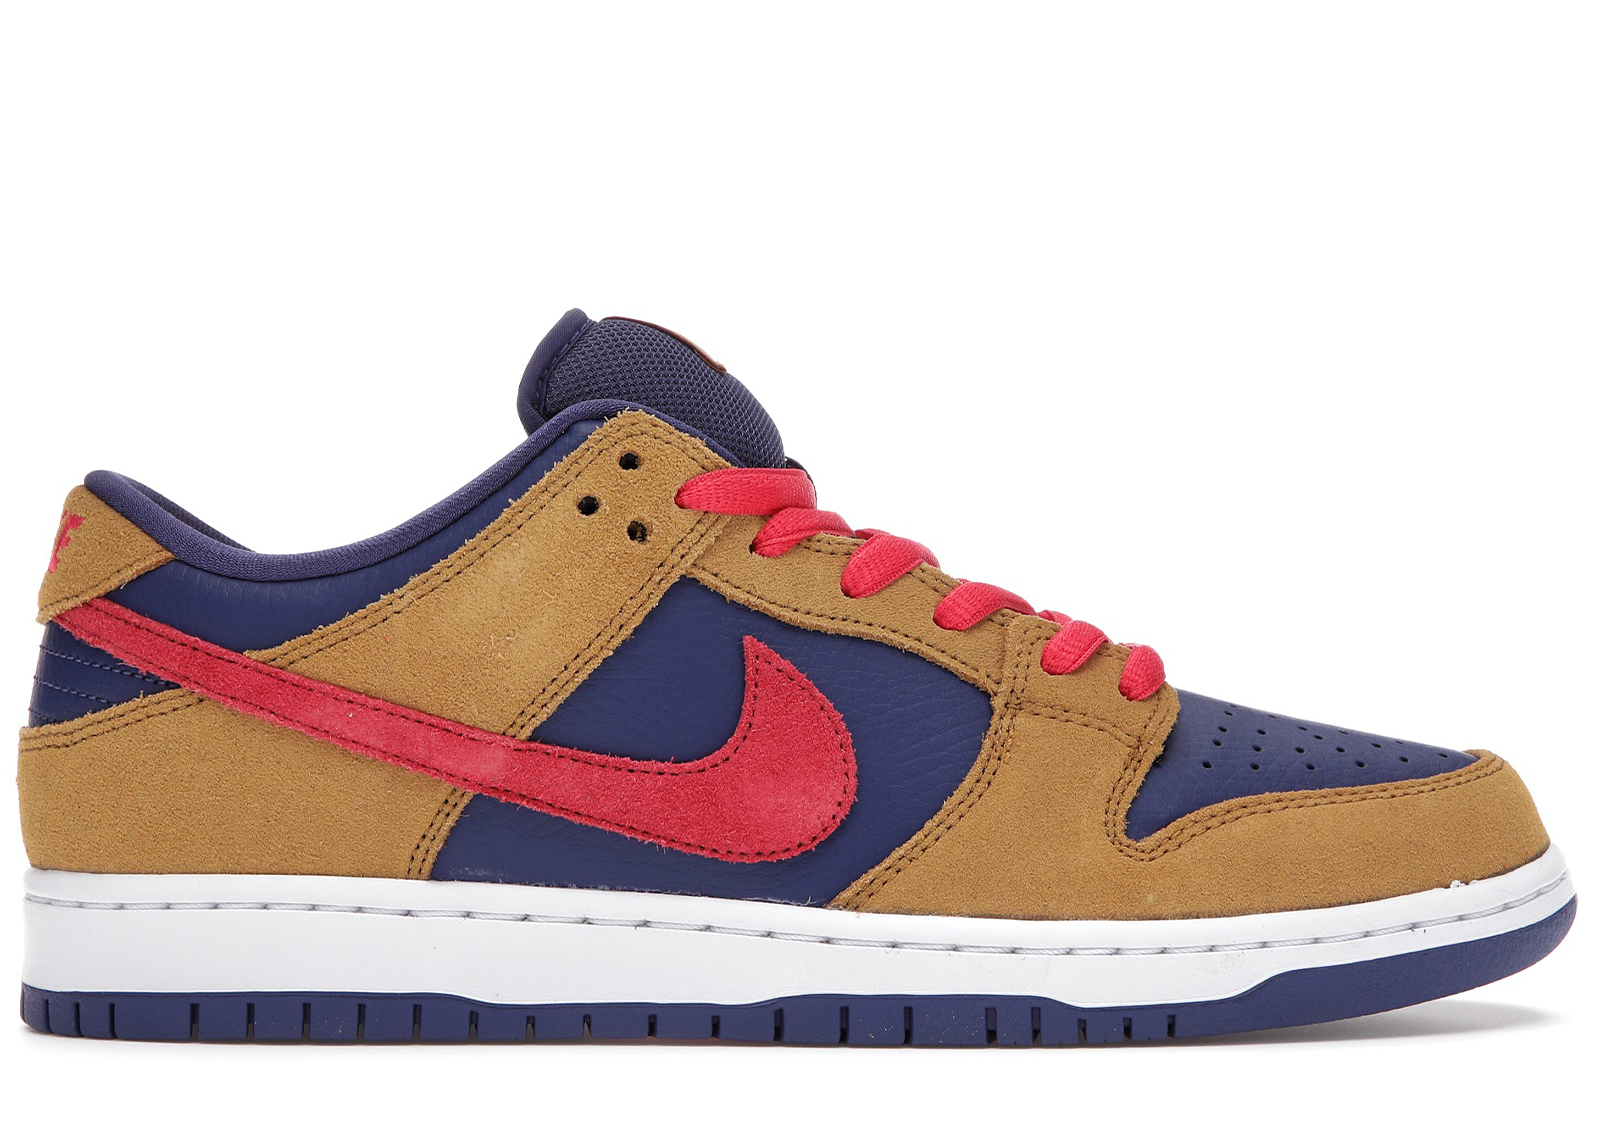 Buy Nike SB SB Dunk Low Shoes & Deadstock Sneakers